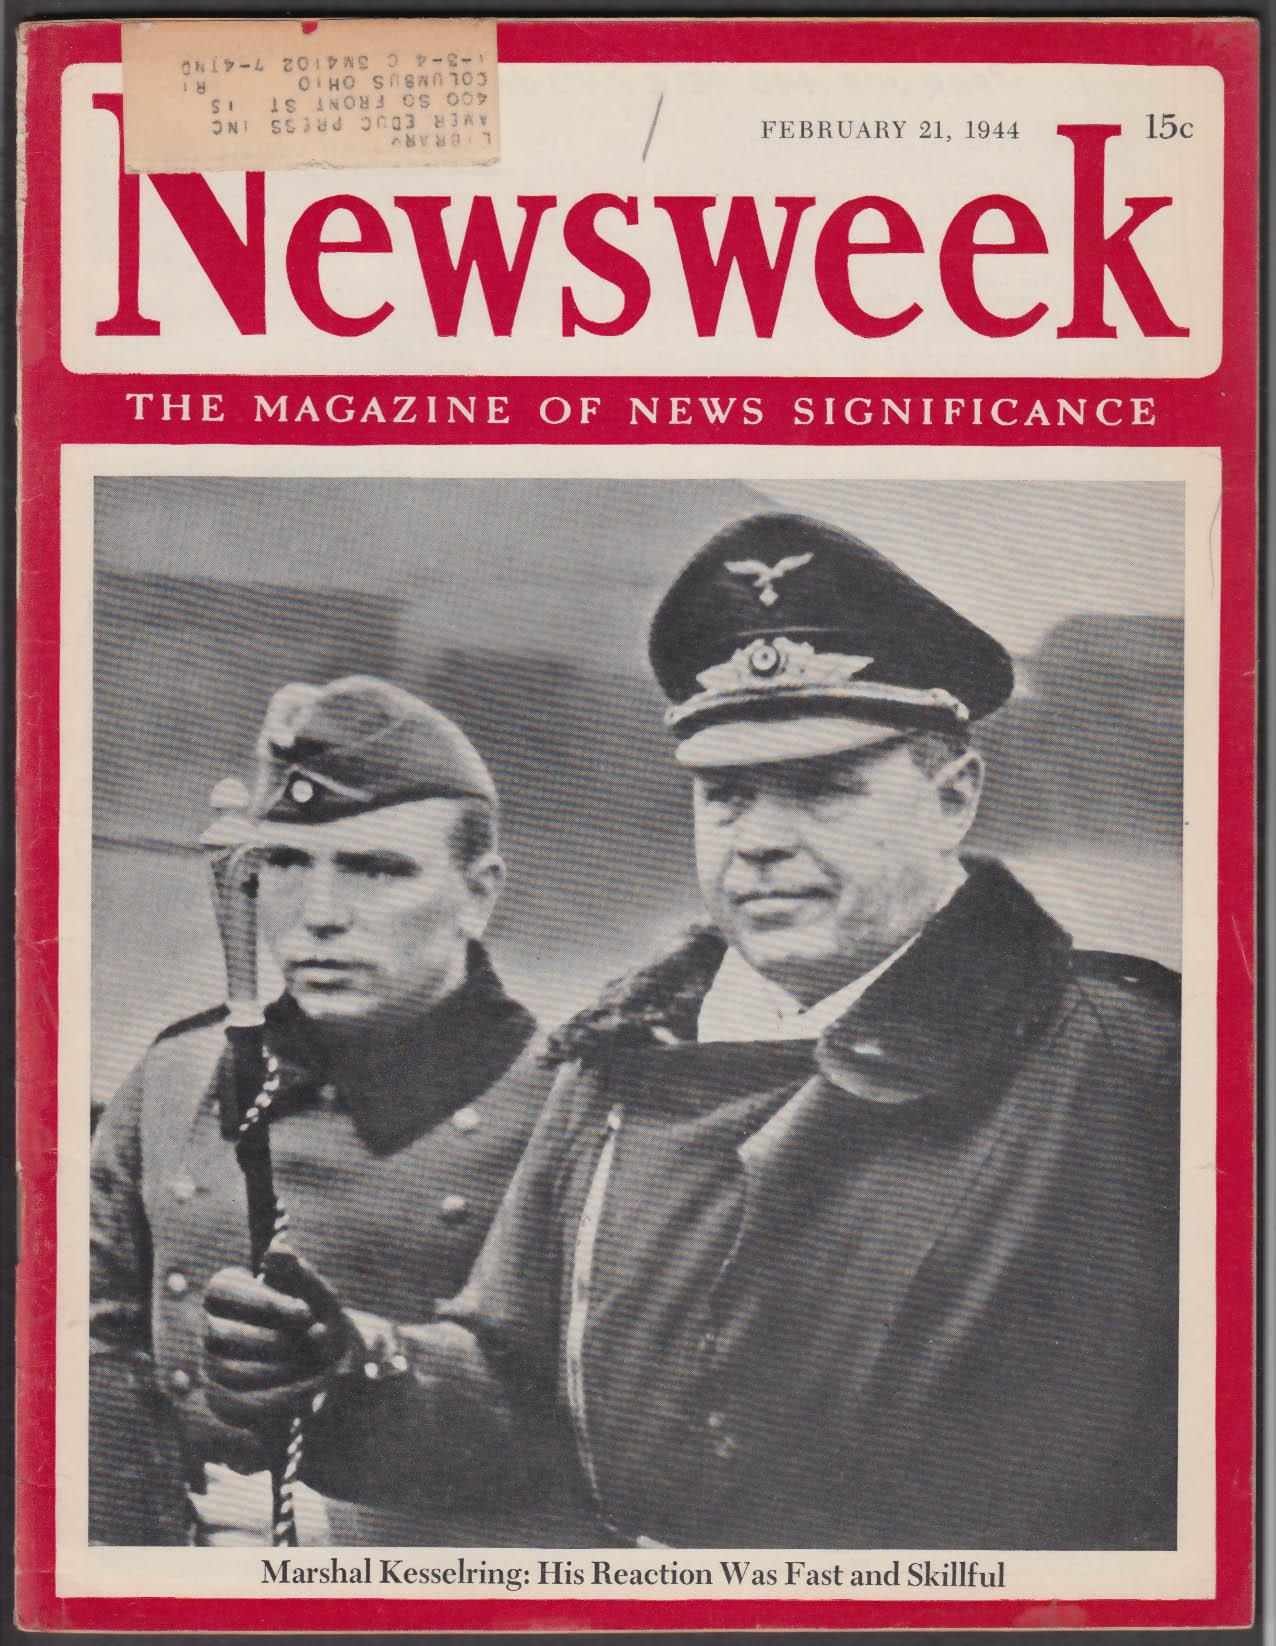 NEWSWEEK Kesselring Anzio Solomons Leningrad Finland Korneichuk + 2/21 1944